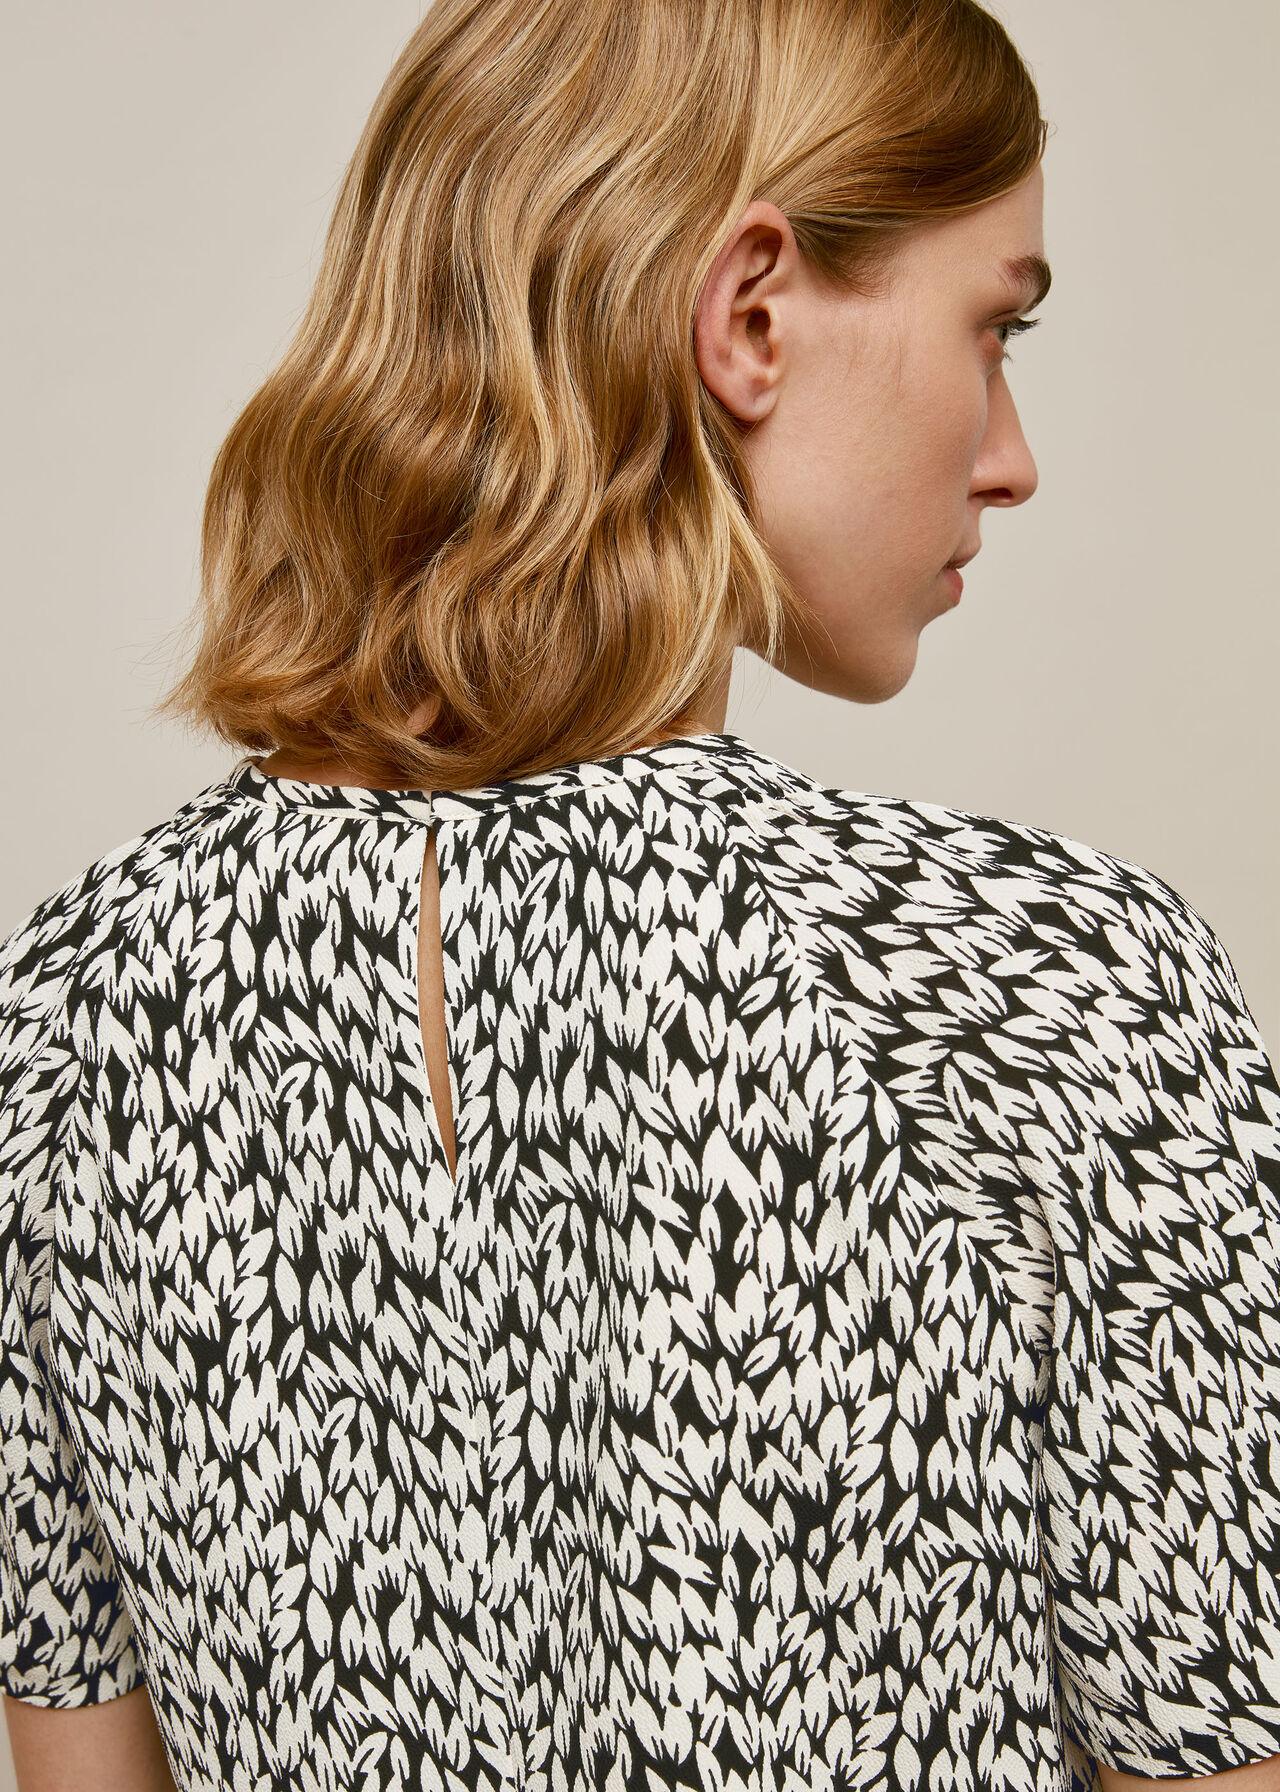 Petal Print Shell Top Black/White